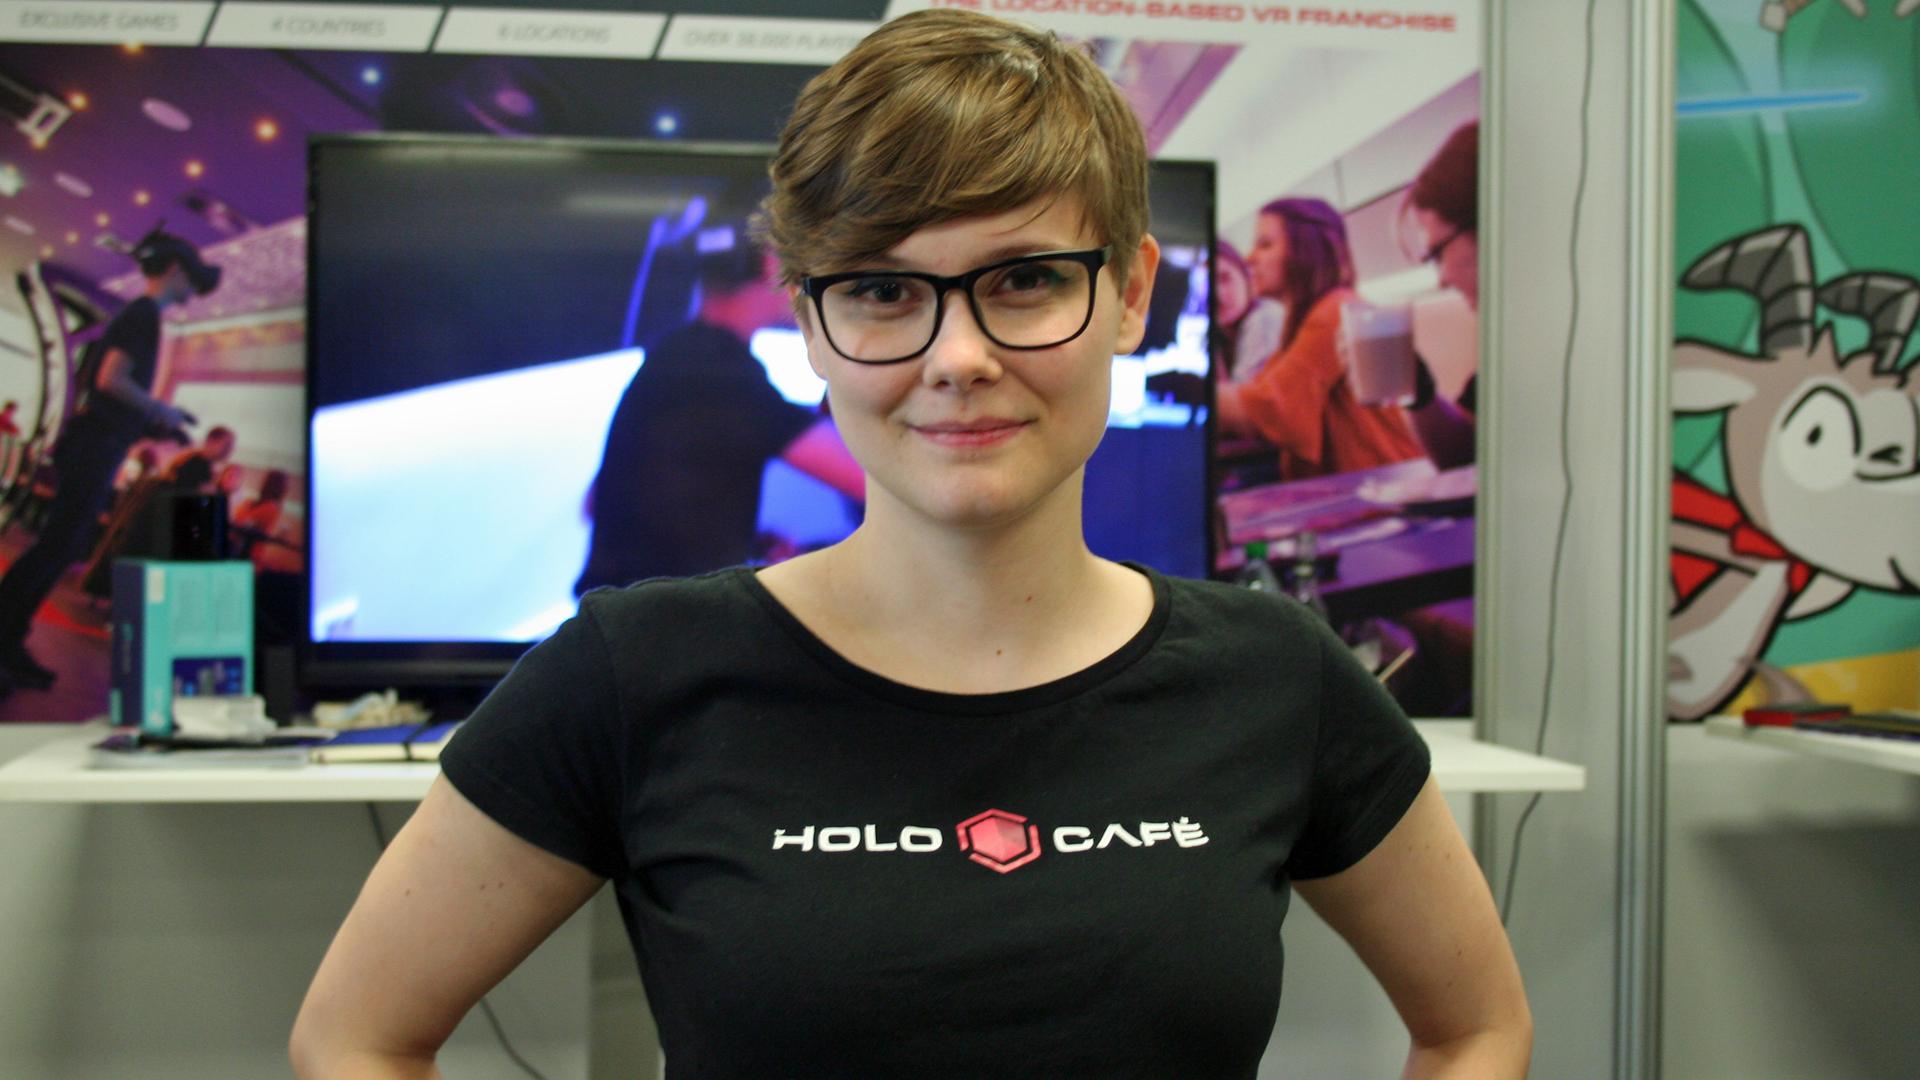 Jessica Karger präsentiert das Holocafé auf der Devcom im Rahmen der Gamescom 2019. Bildrechte: WDR / Thomas Ruscher